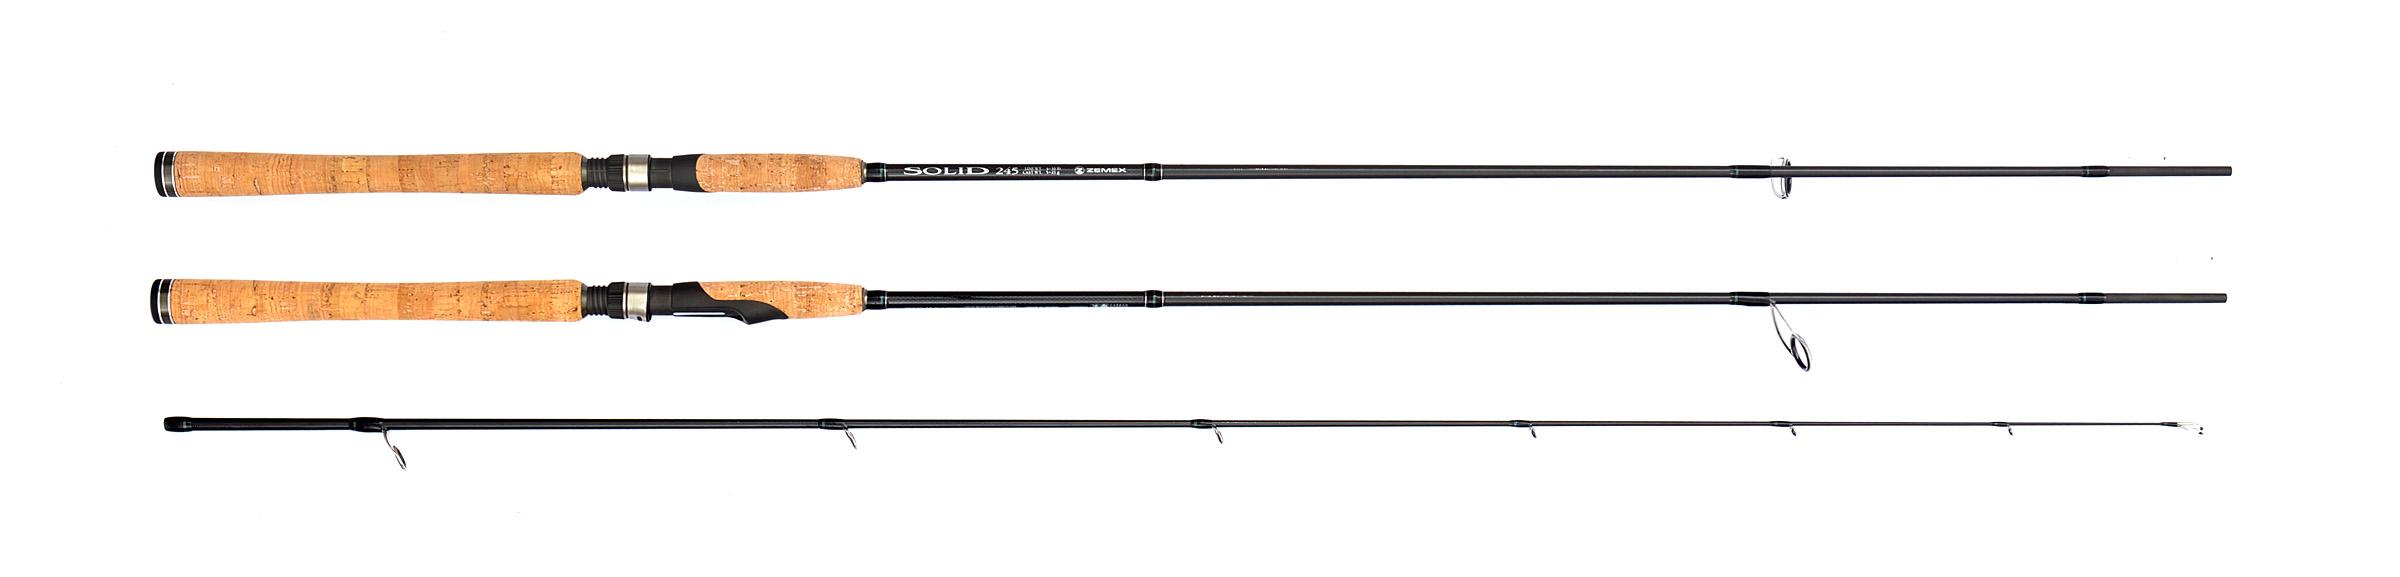 Спиннинг Zemex Solid 2,65м 7-35гр NEW